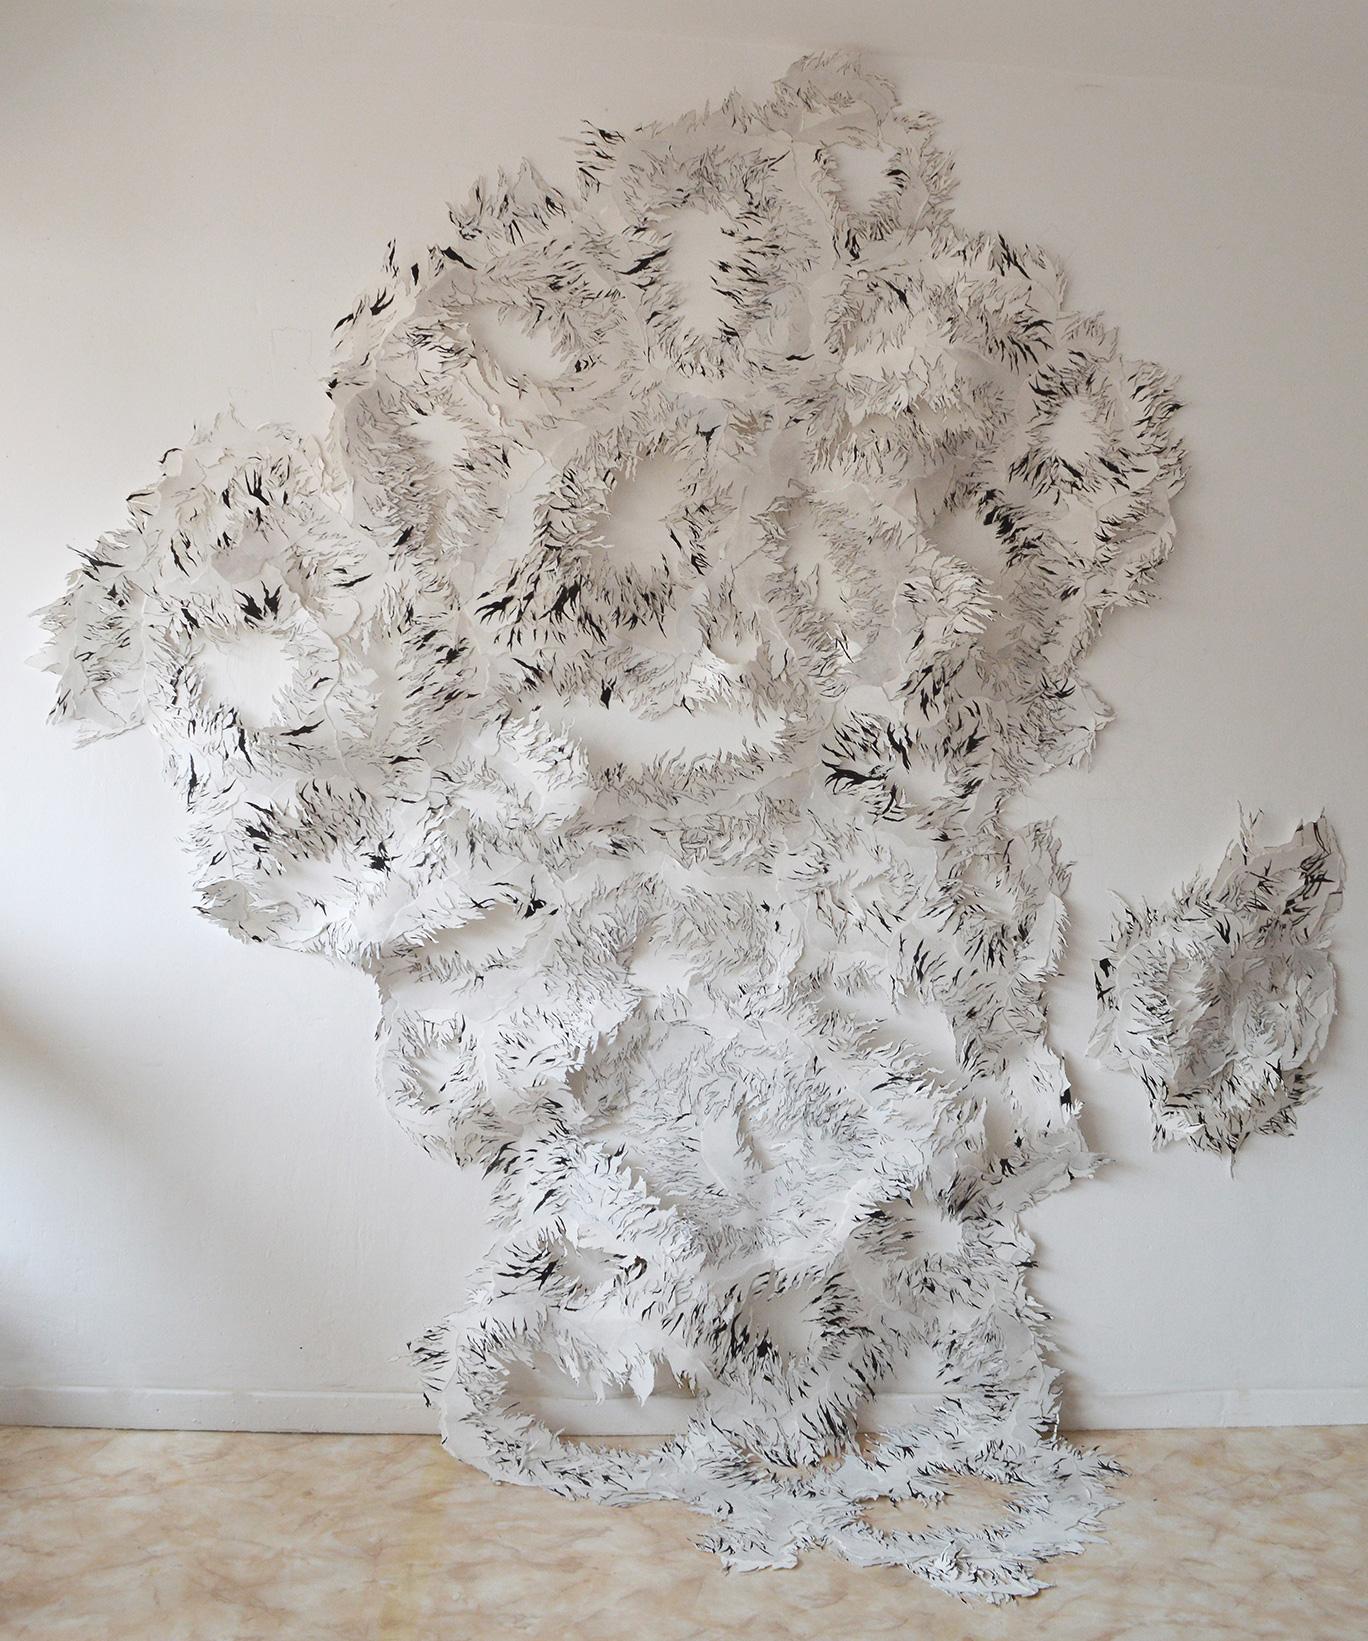 <i>Les choses blanches</i>, 2013, 300x200cm, photo d'atelier